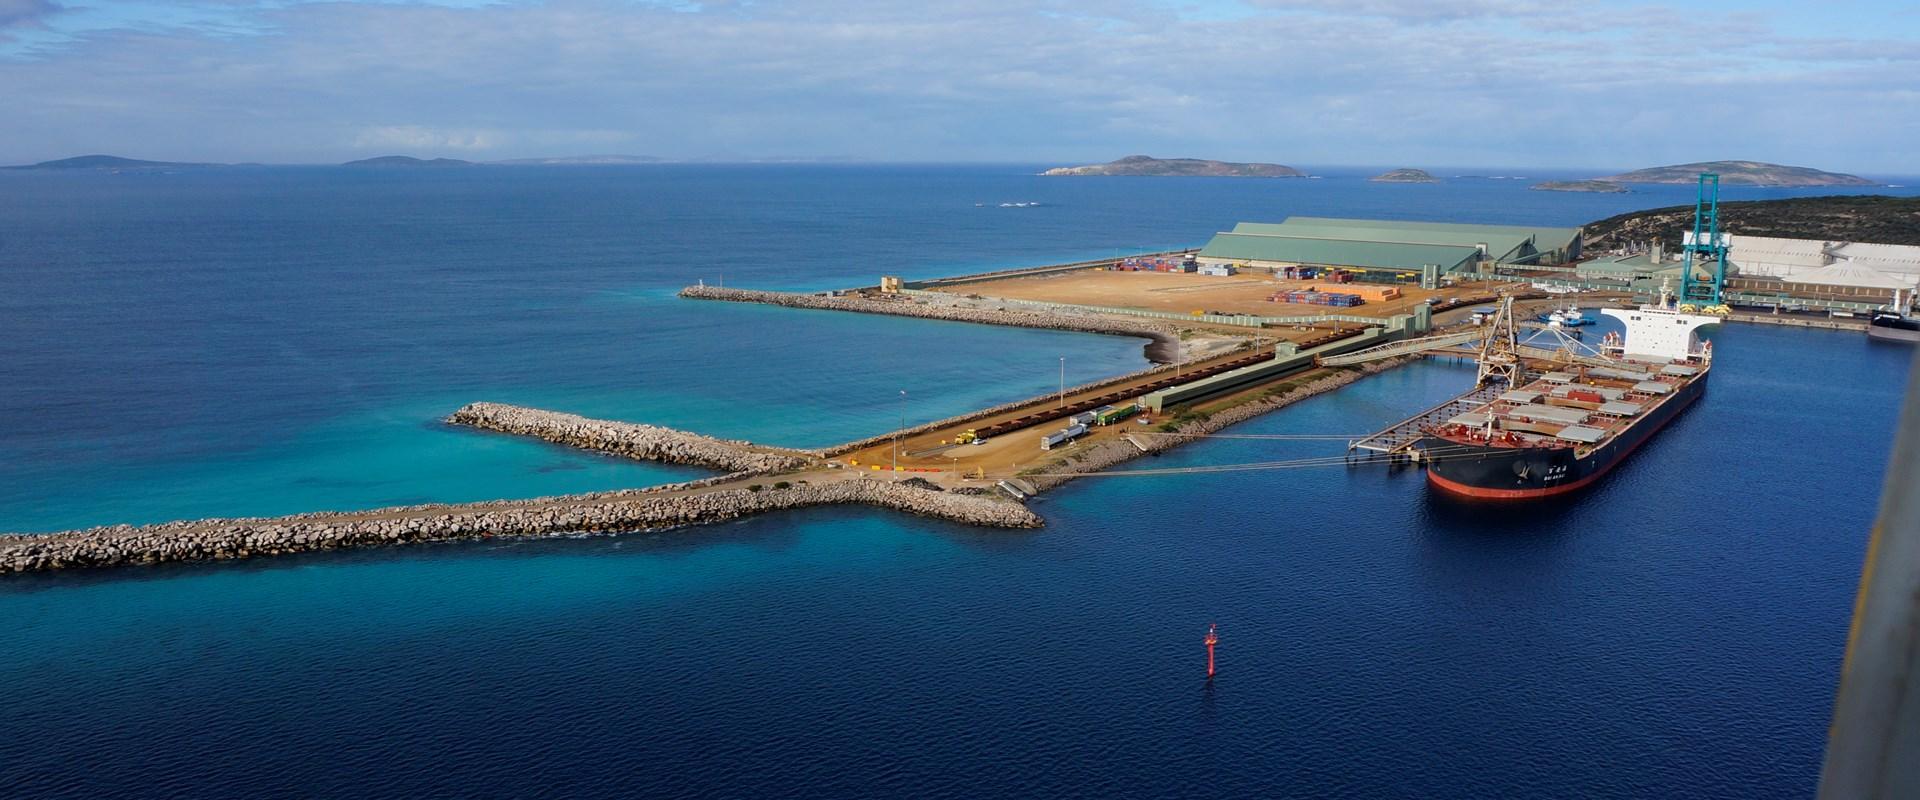 Coastal Infrastructure